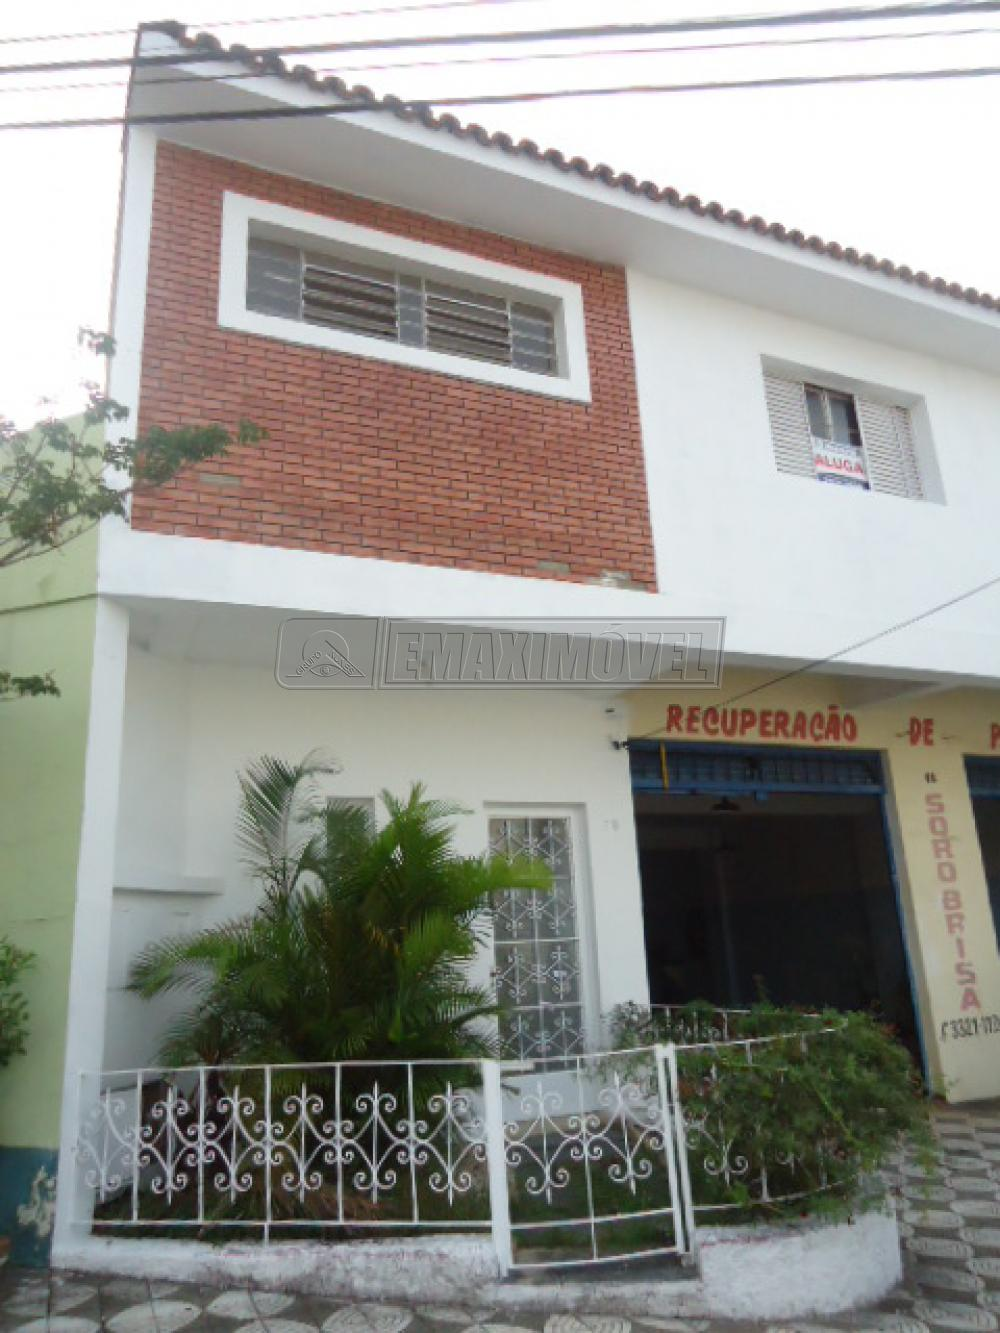 Comprar Casa / Finalidade Comercial em Sorocaba R$ 845.000,00 - Foto 1